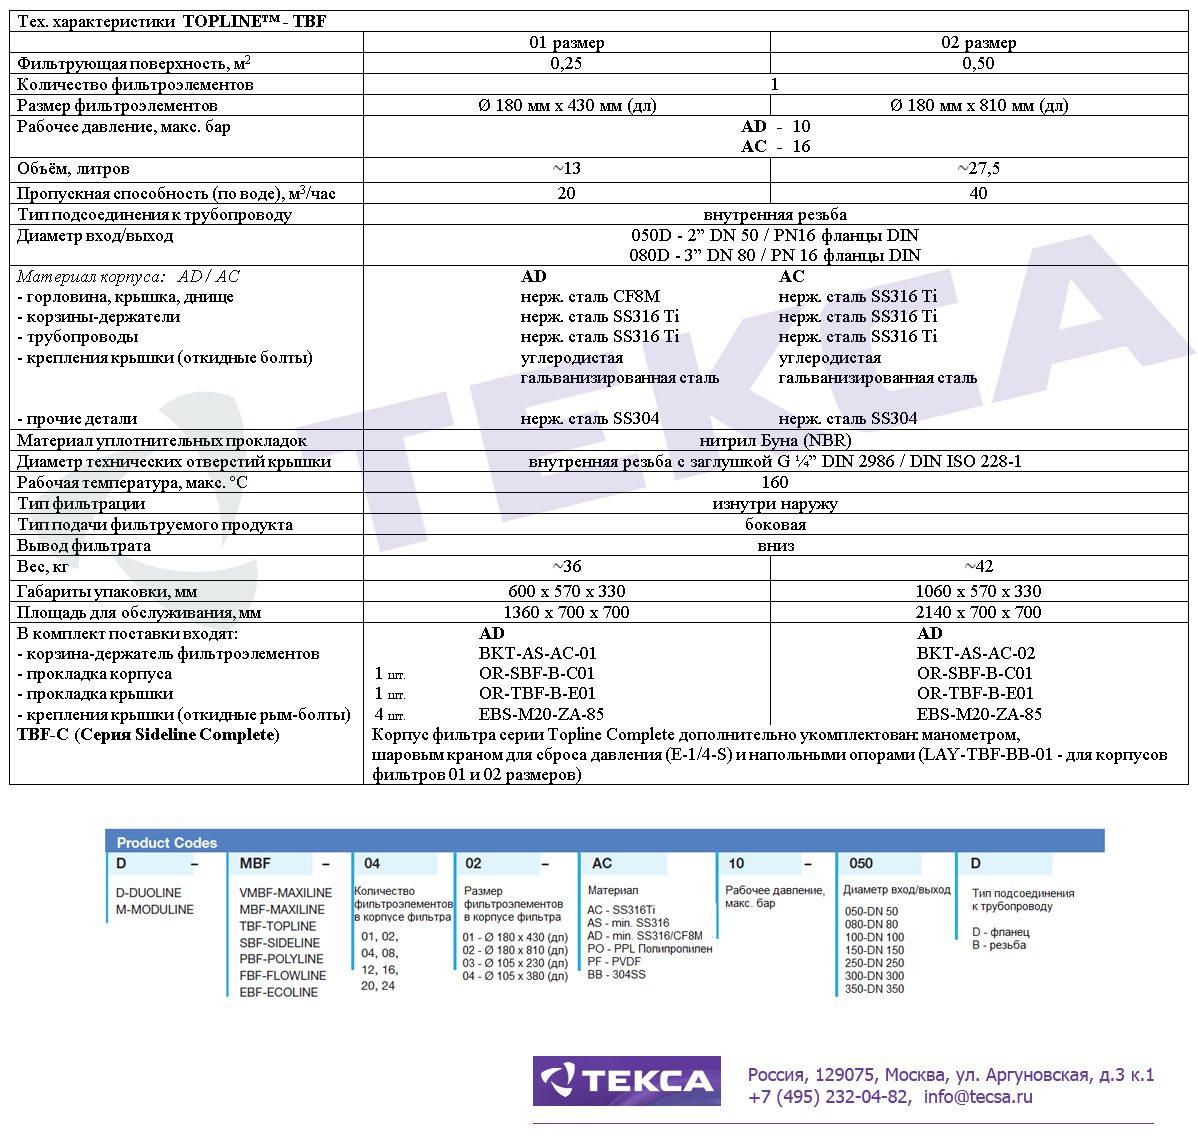 Технические характеристики корпуса фильтра TOPLINE -TBF